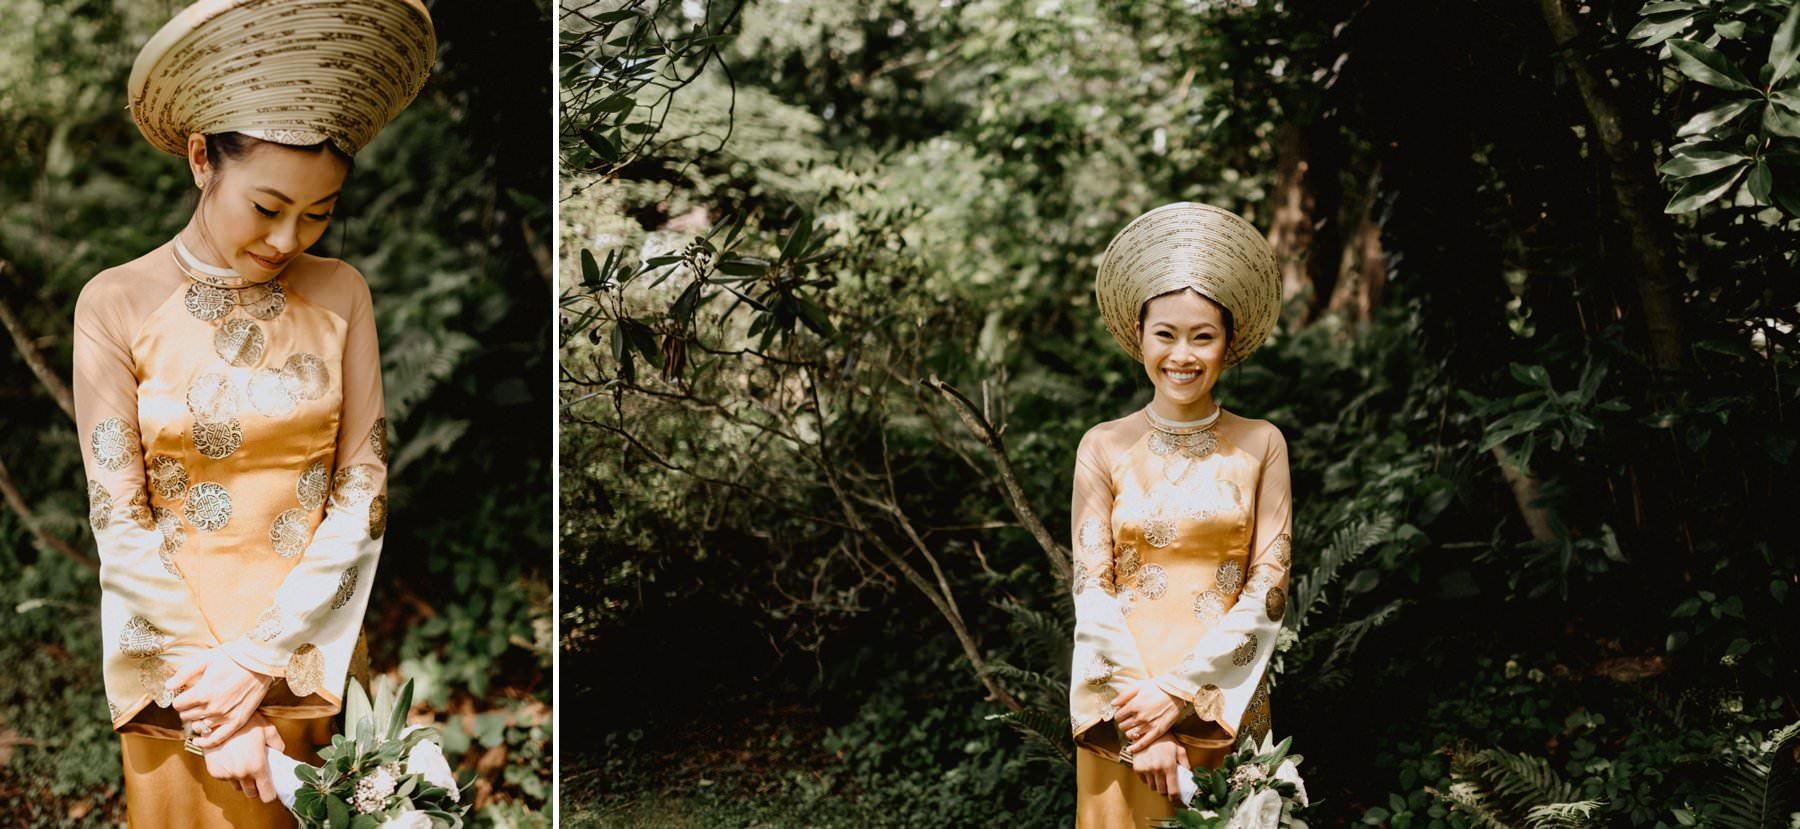 Appleford-estate-wedding-29.jpg